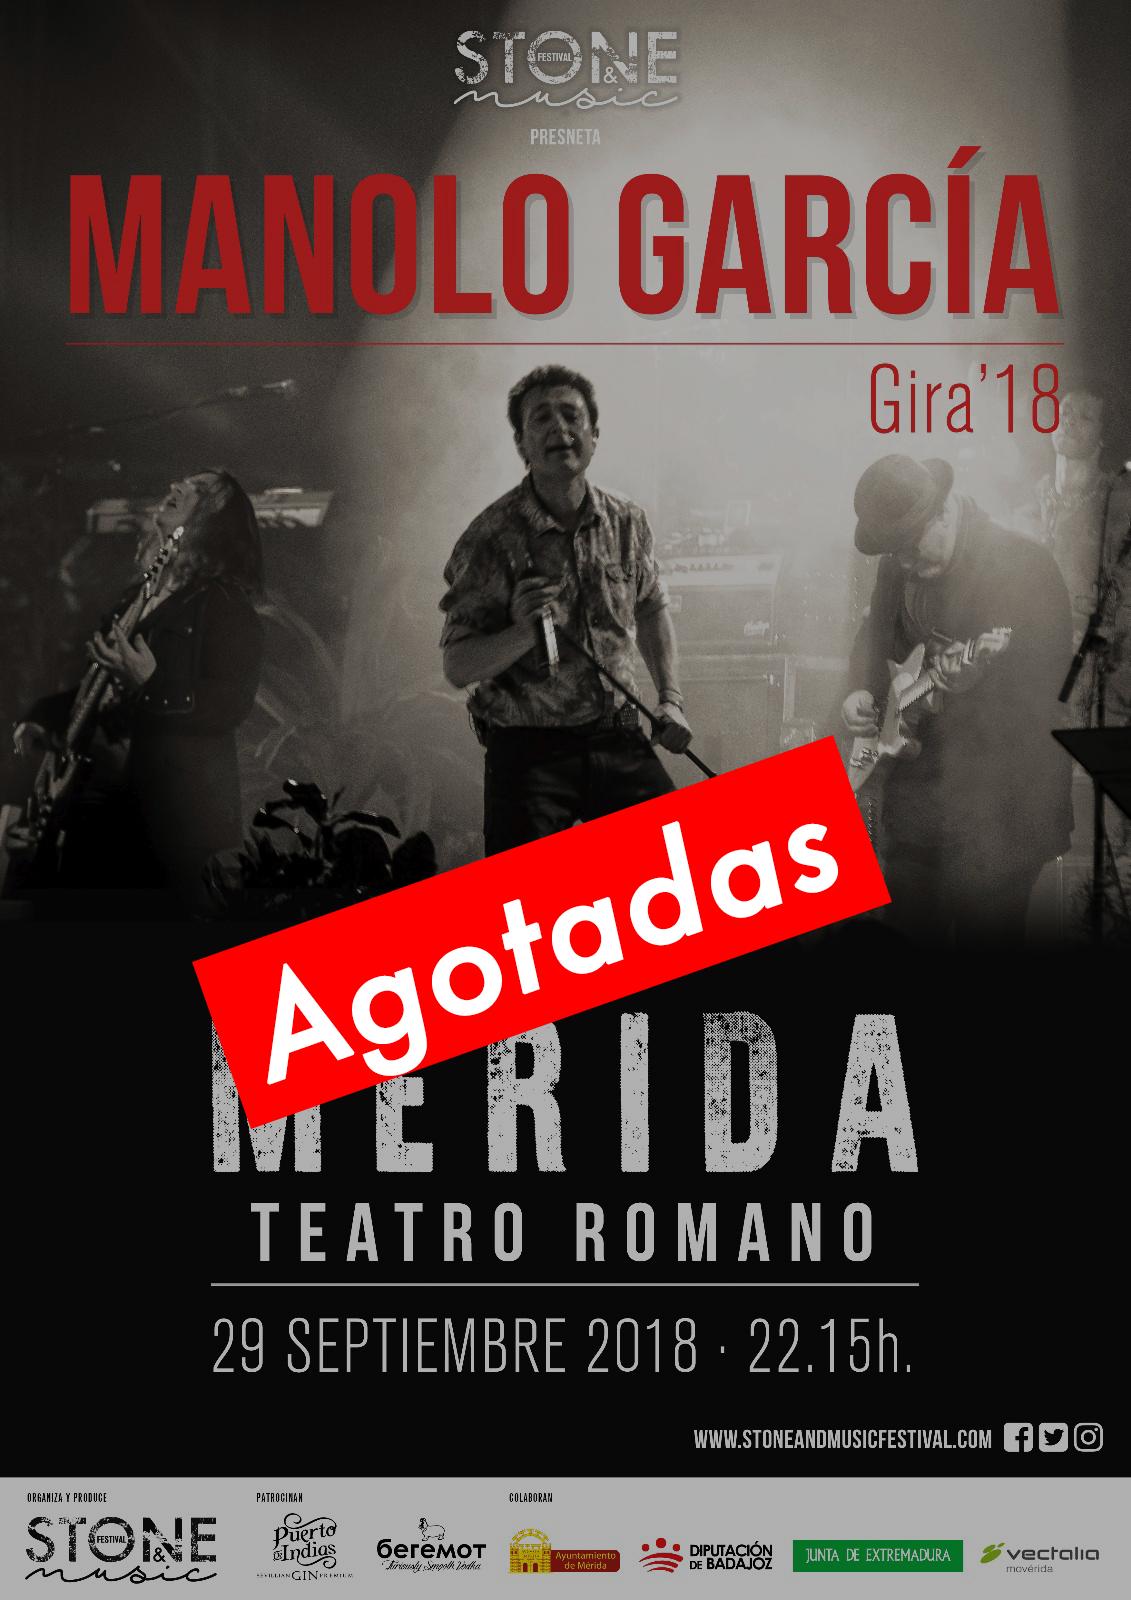 Manolo García agotado